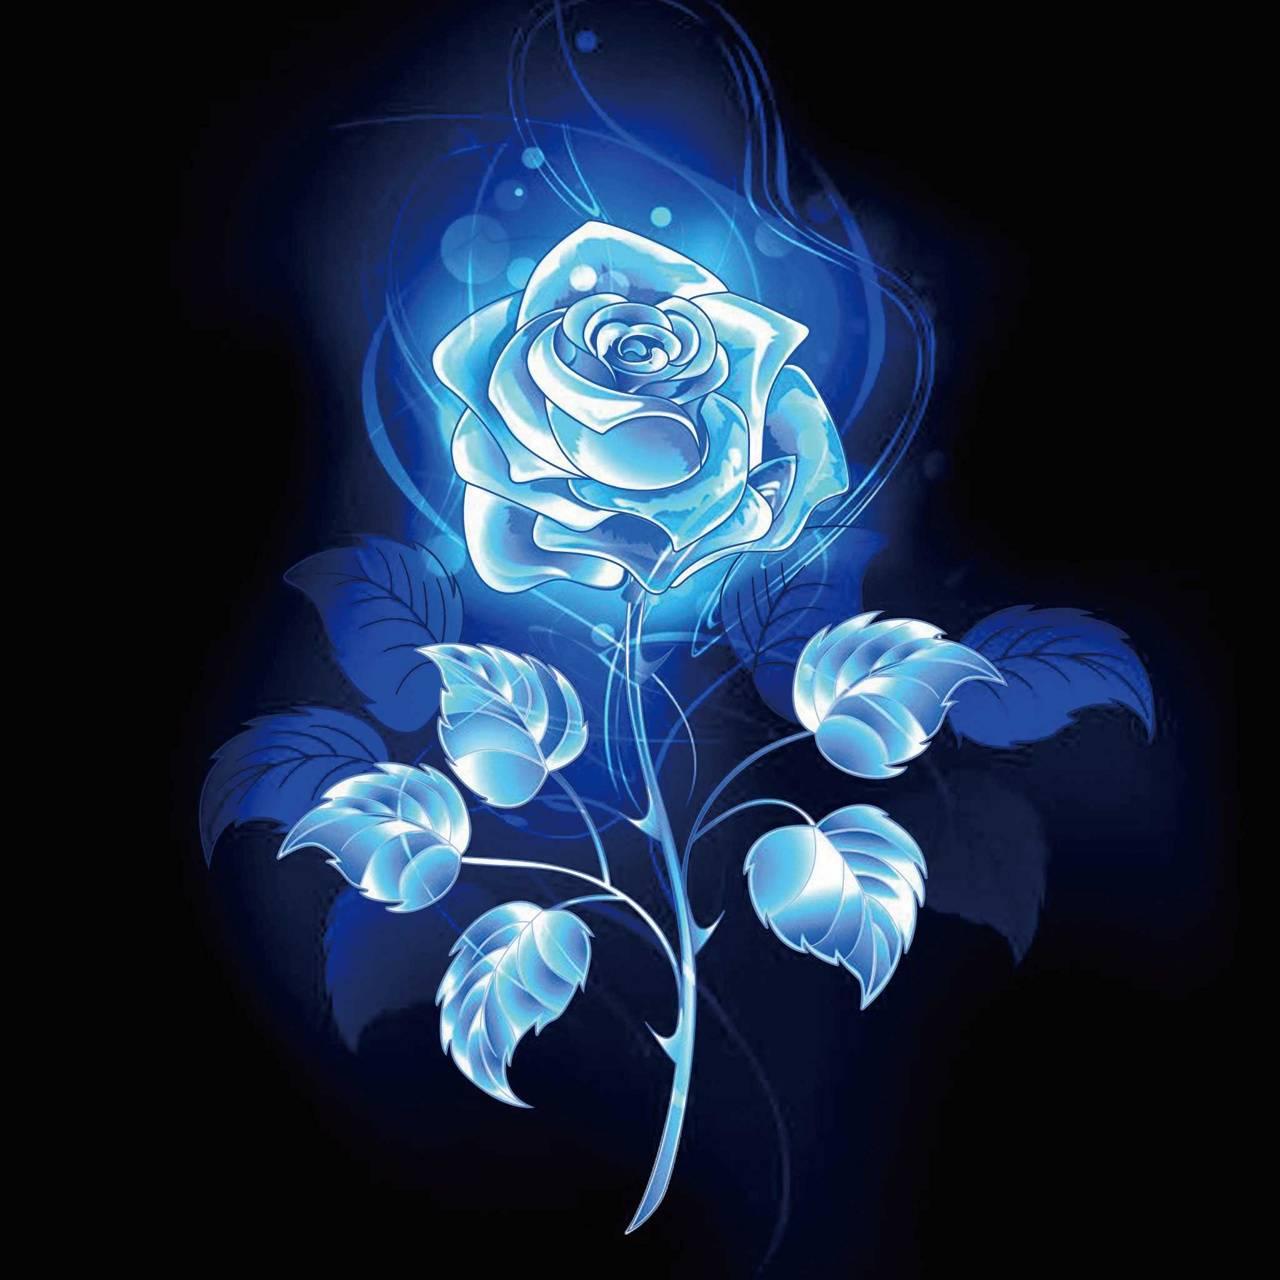 Blue Rose wallpaper by whisperedenvy1966460 - 69 - Free on ZEDGE™